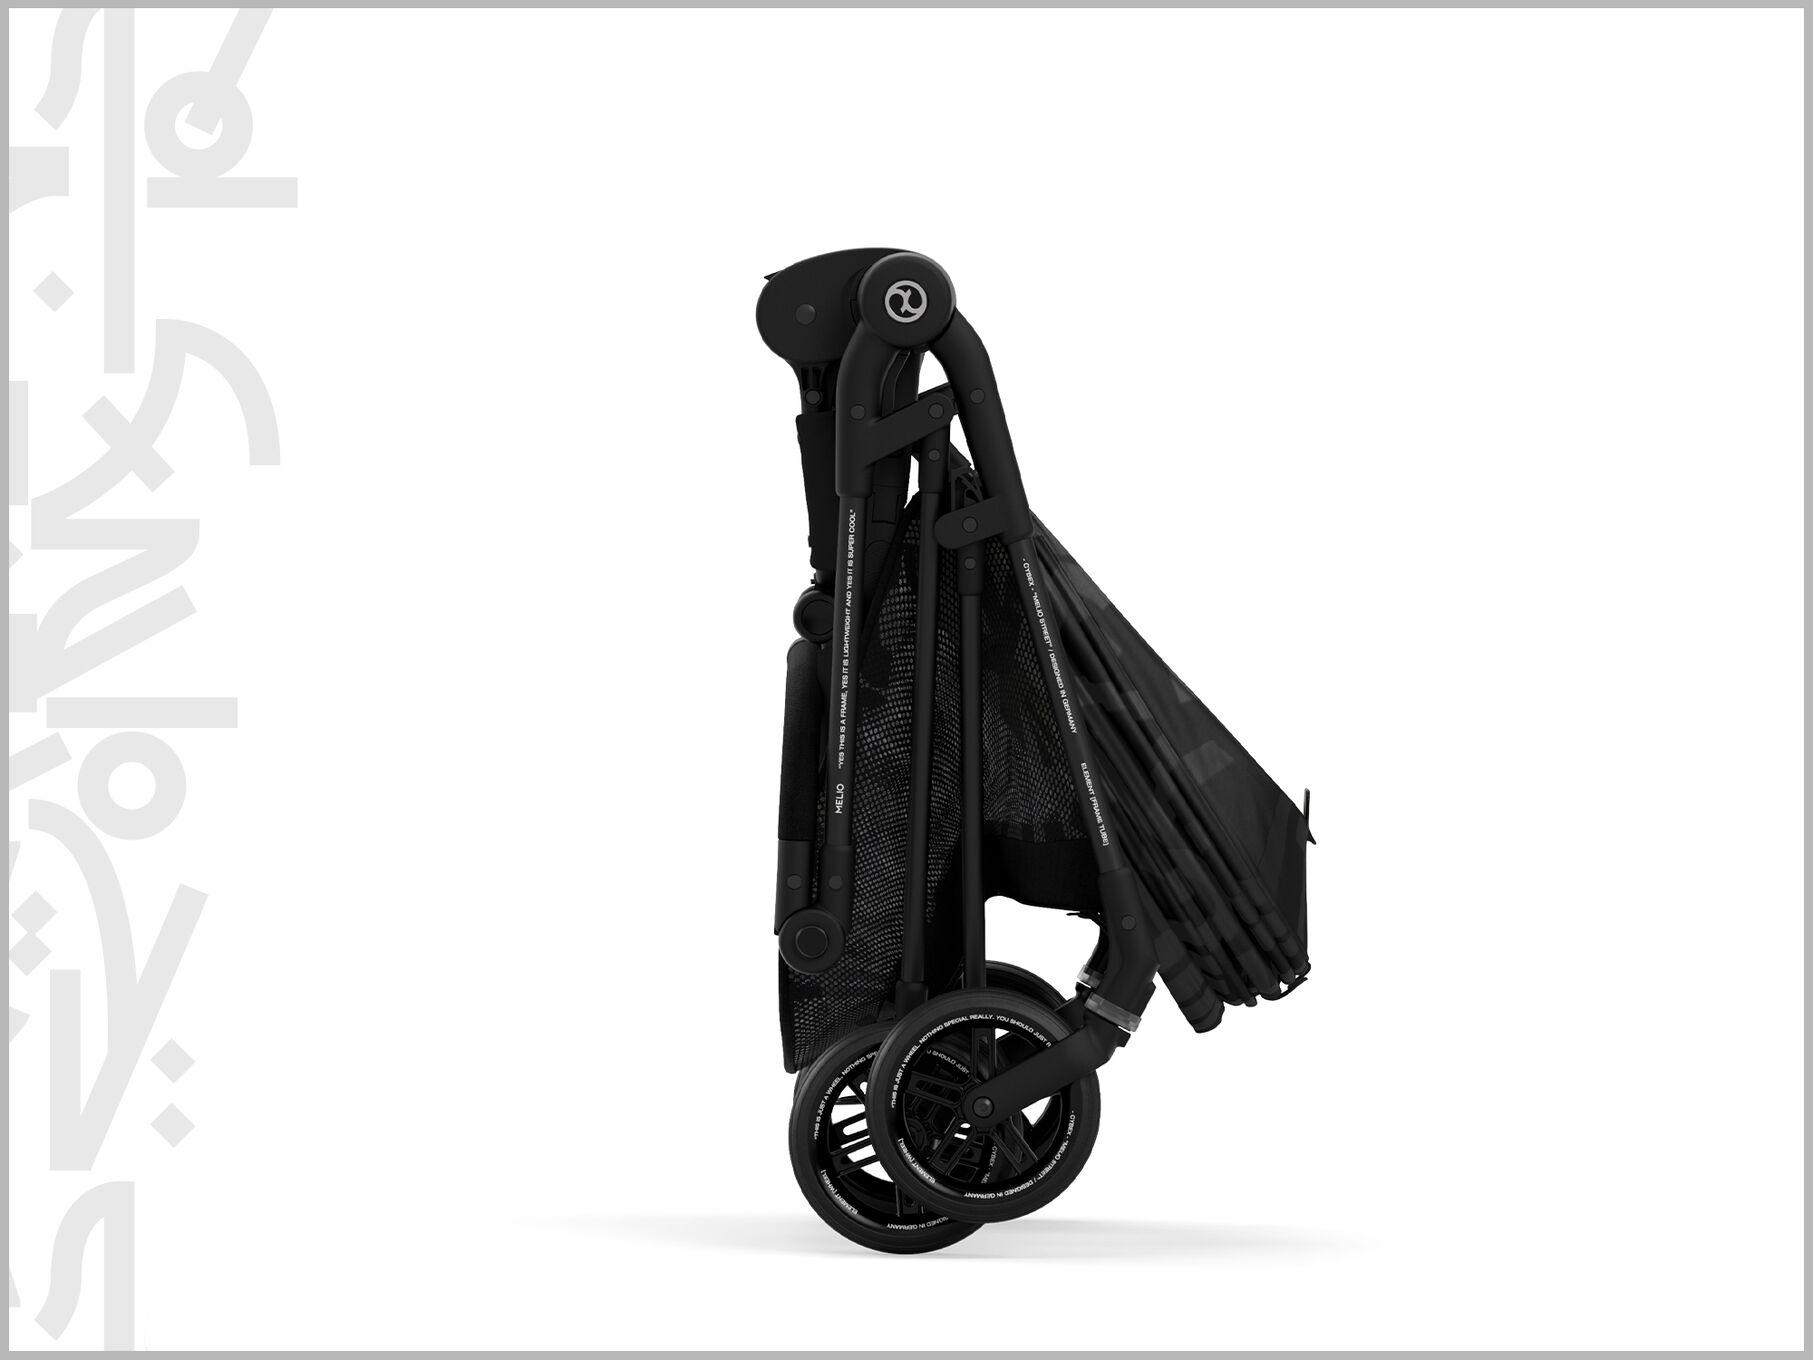 Cybex Gold Melio Street Stroller Compact Fold